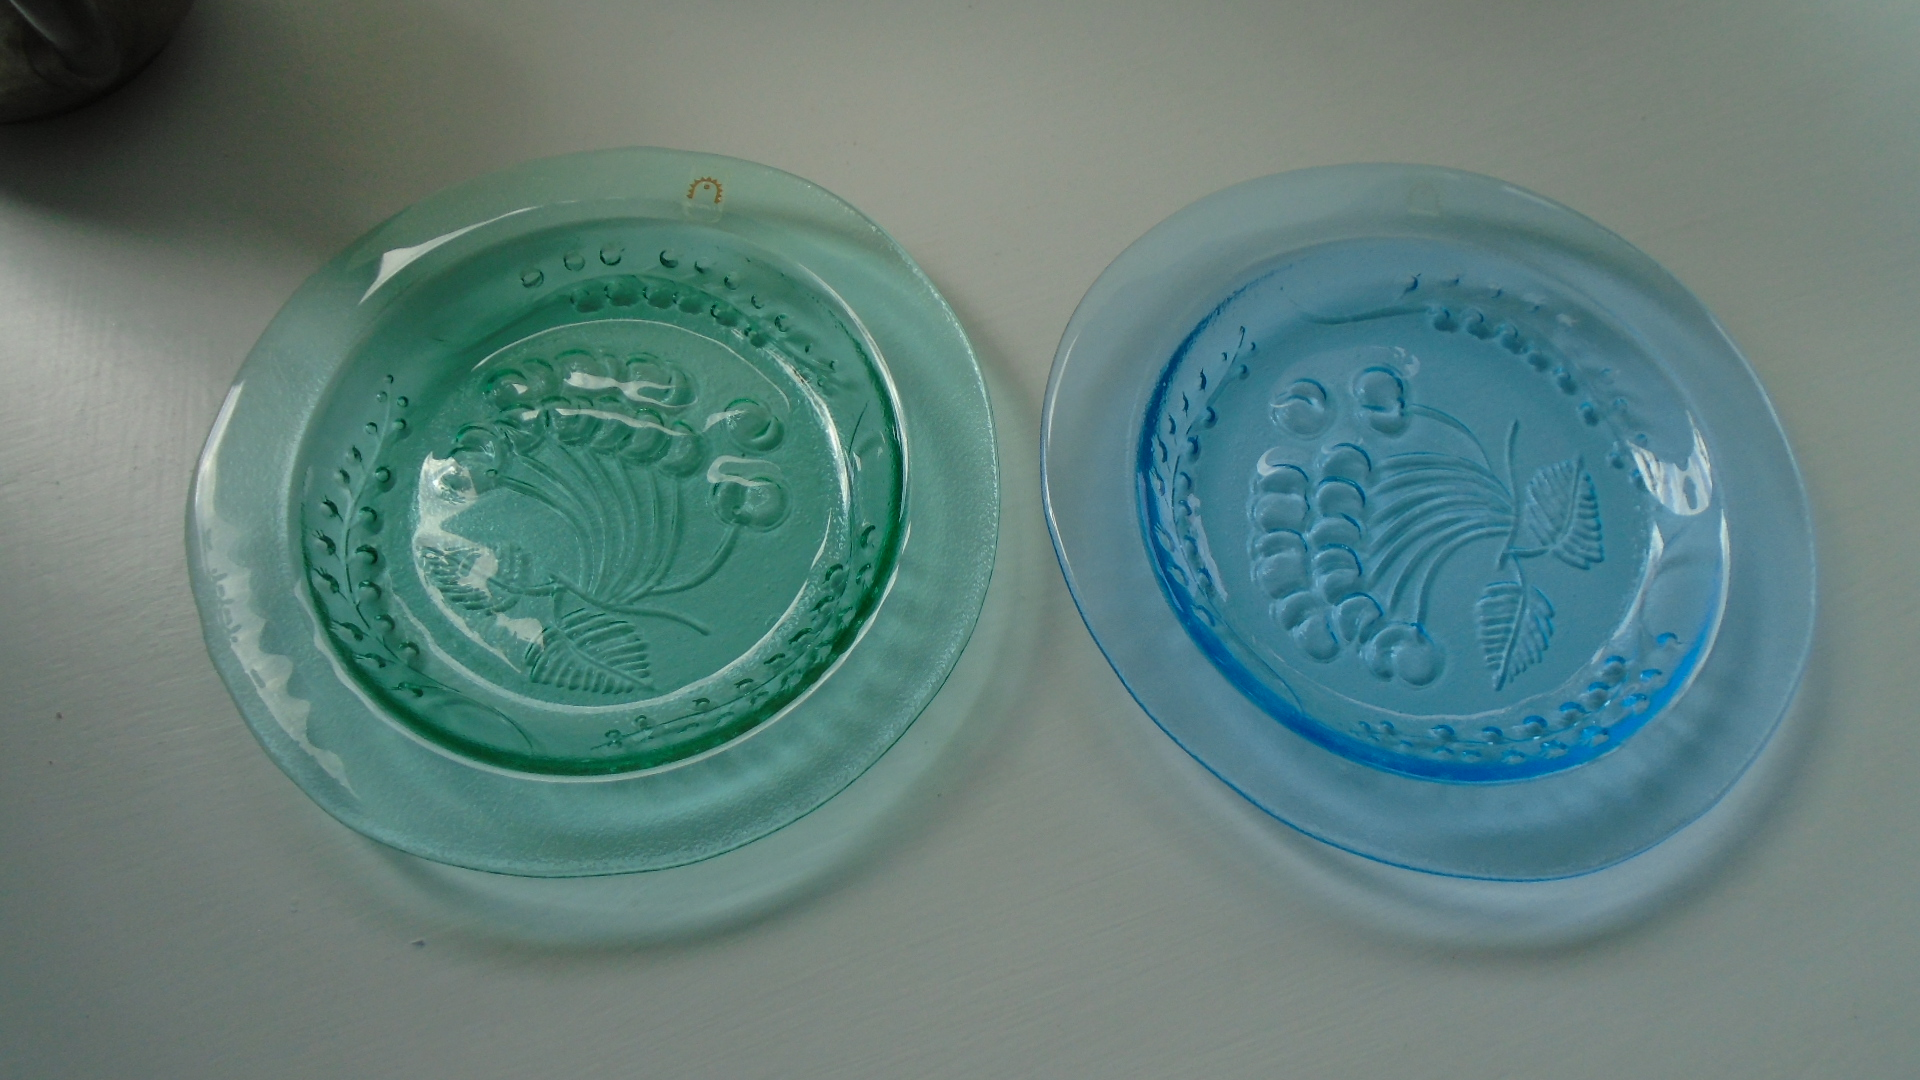 Pair of Vintage Finnish Humppila Decorative Pressed Glass Plates from Humppila's Botanical Range designed by Kaija Aarikka.